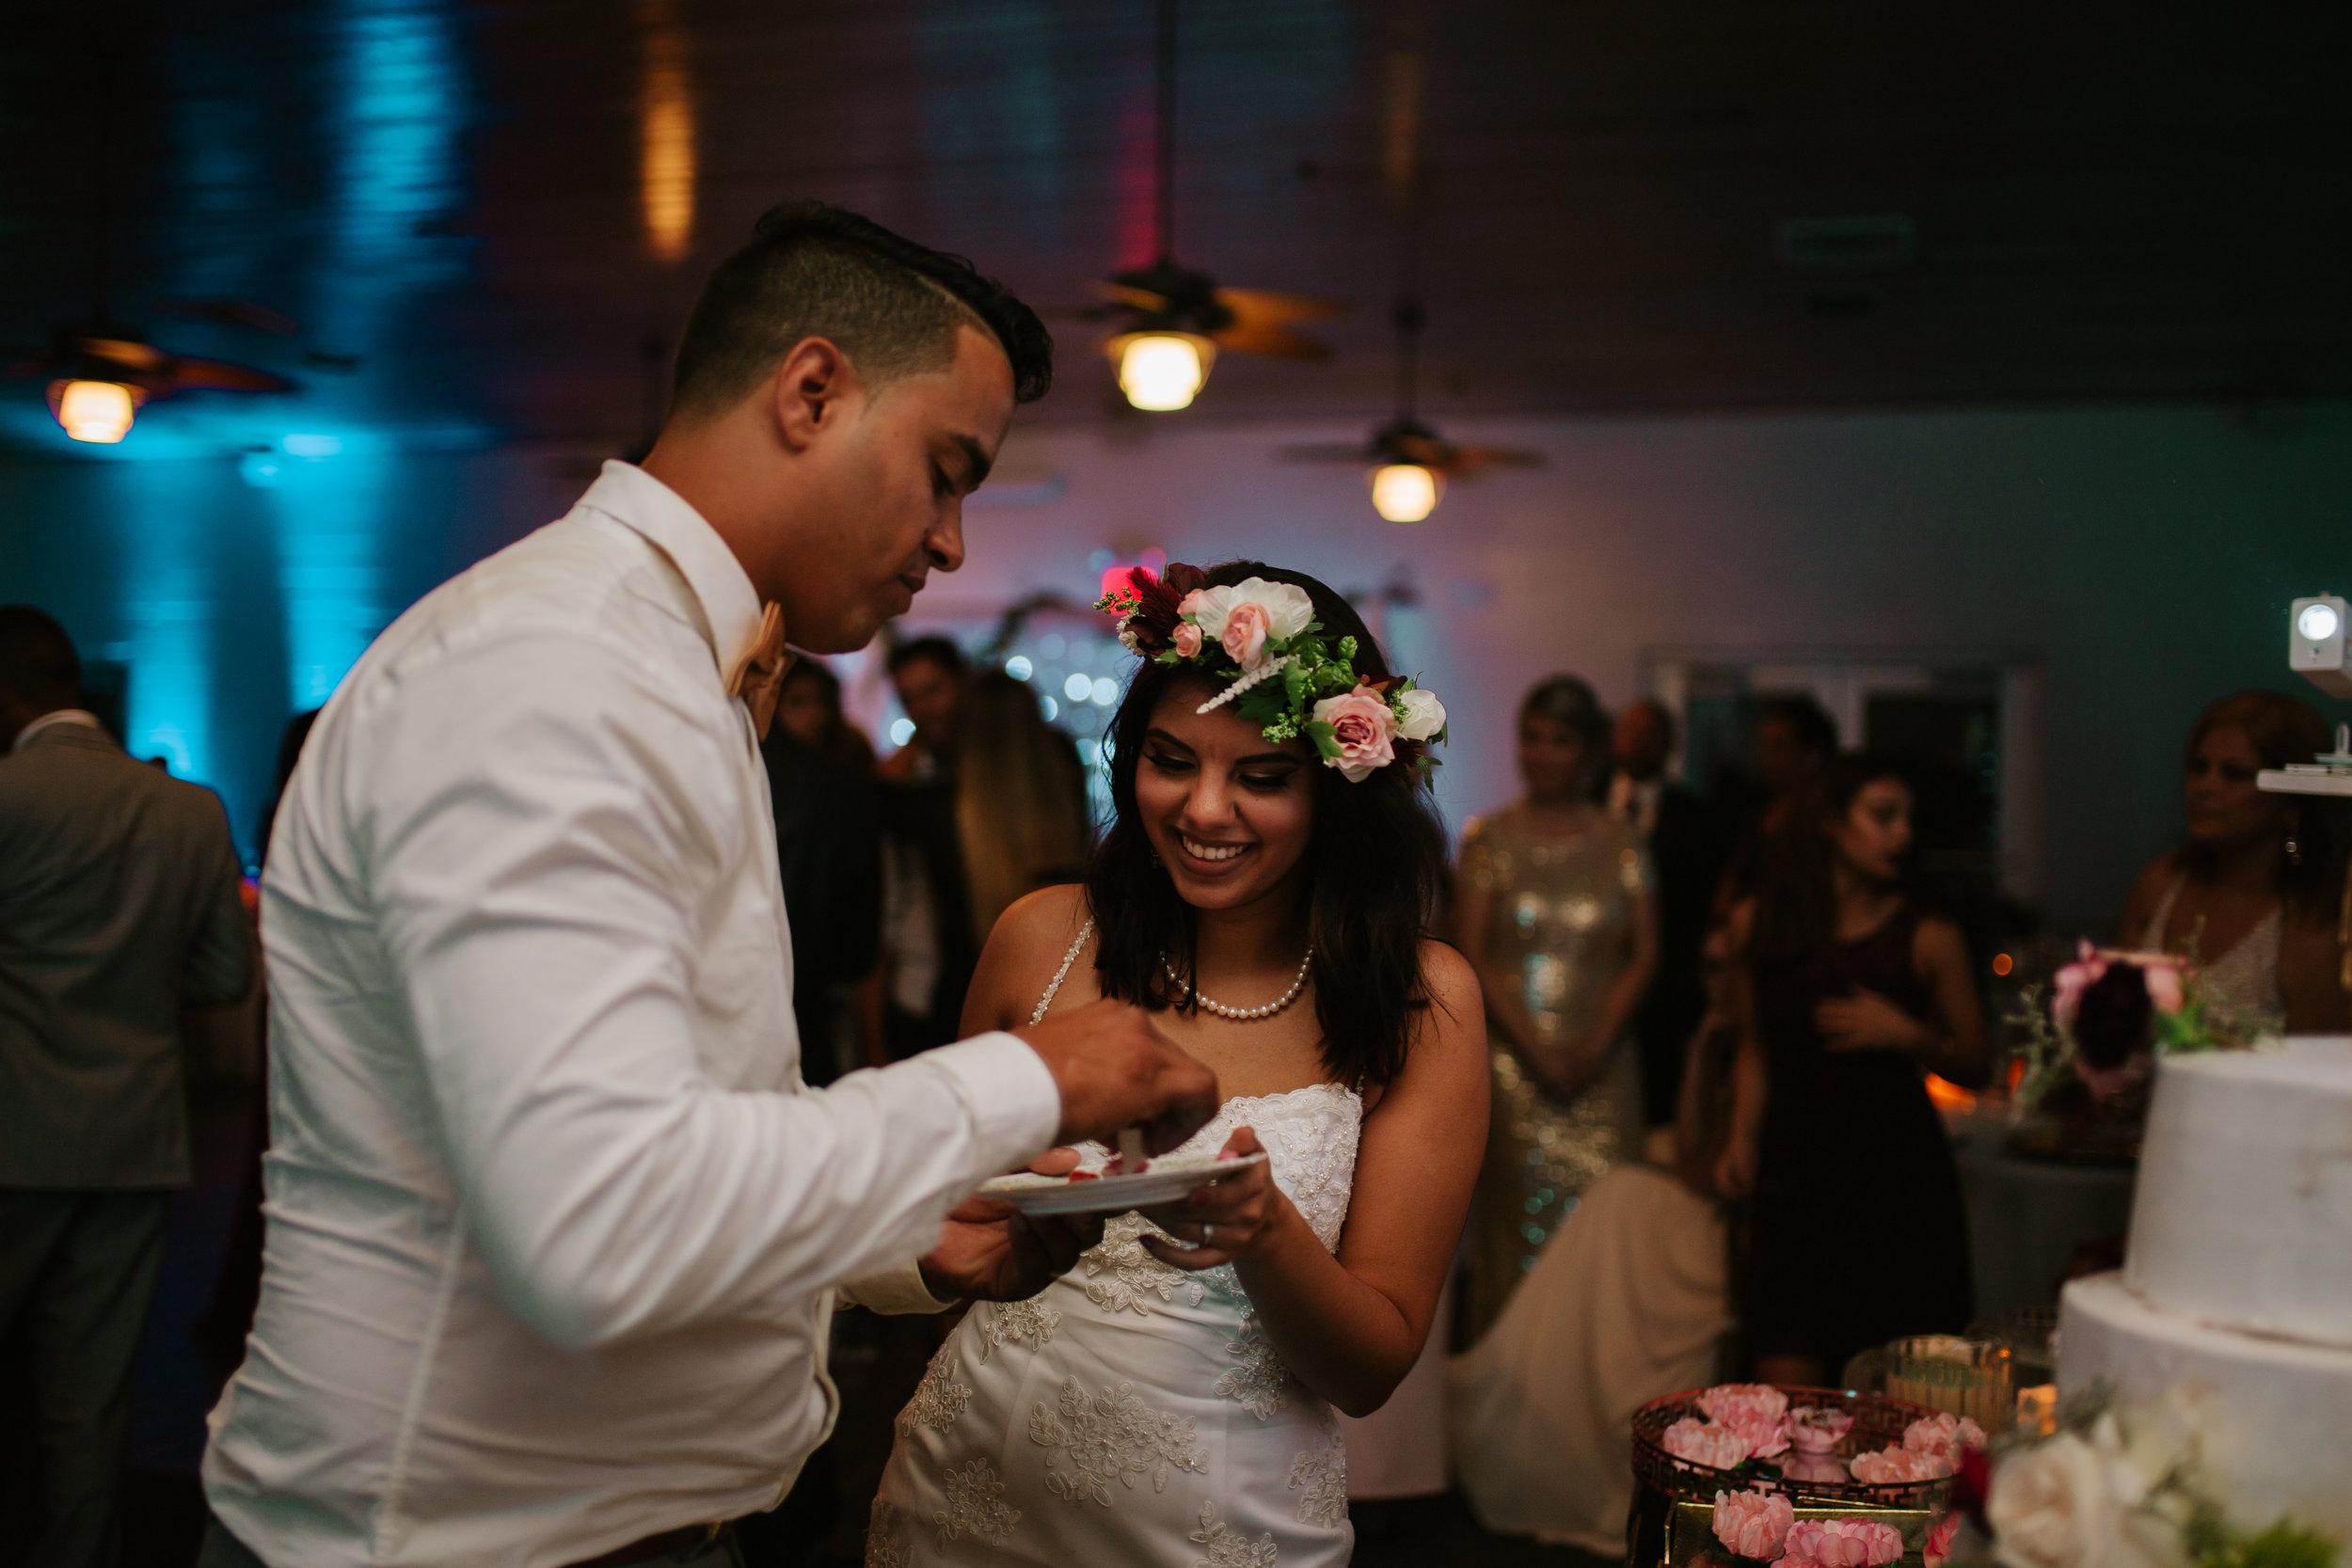 2017.05.23 Barbara and Mauricio Sales Port St Lucie Wedding (752 of 772).jpg